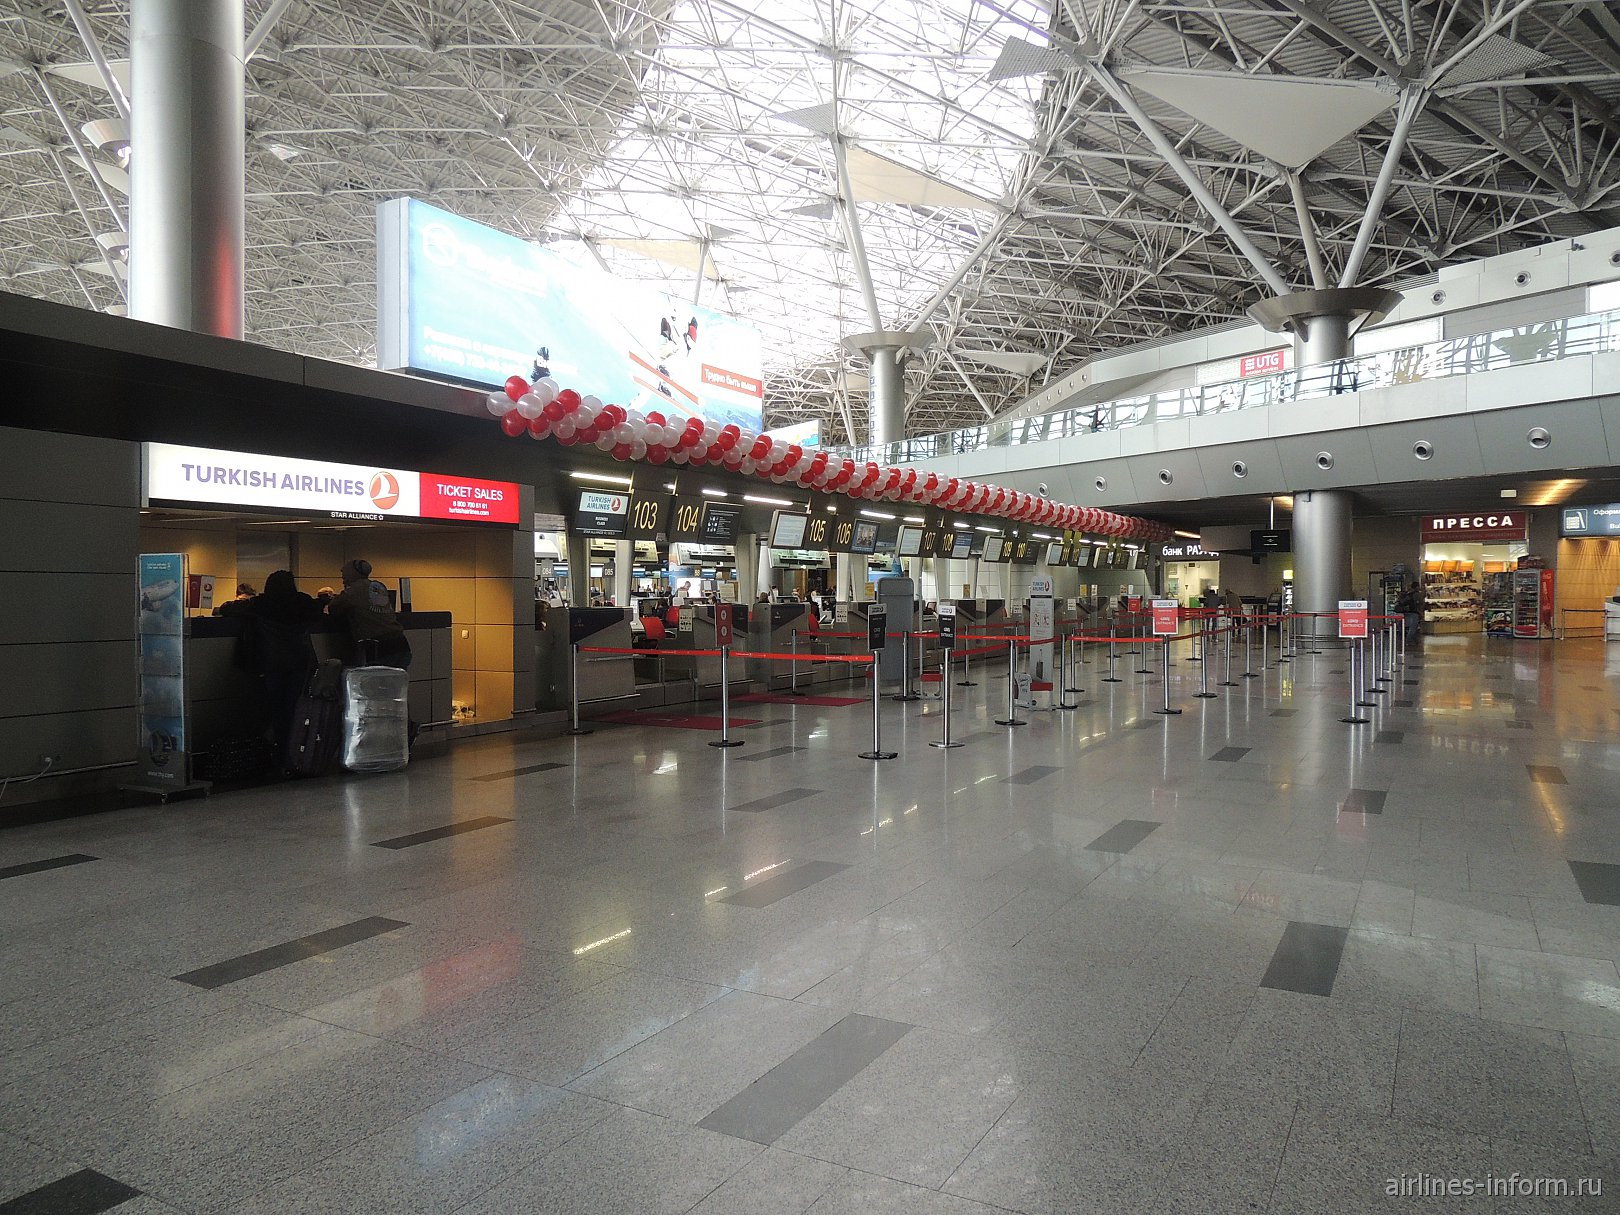 Стойки регистрации Турецких авиалиний в аэропорту Москва Внуково